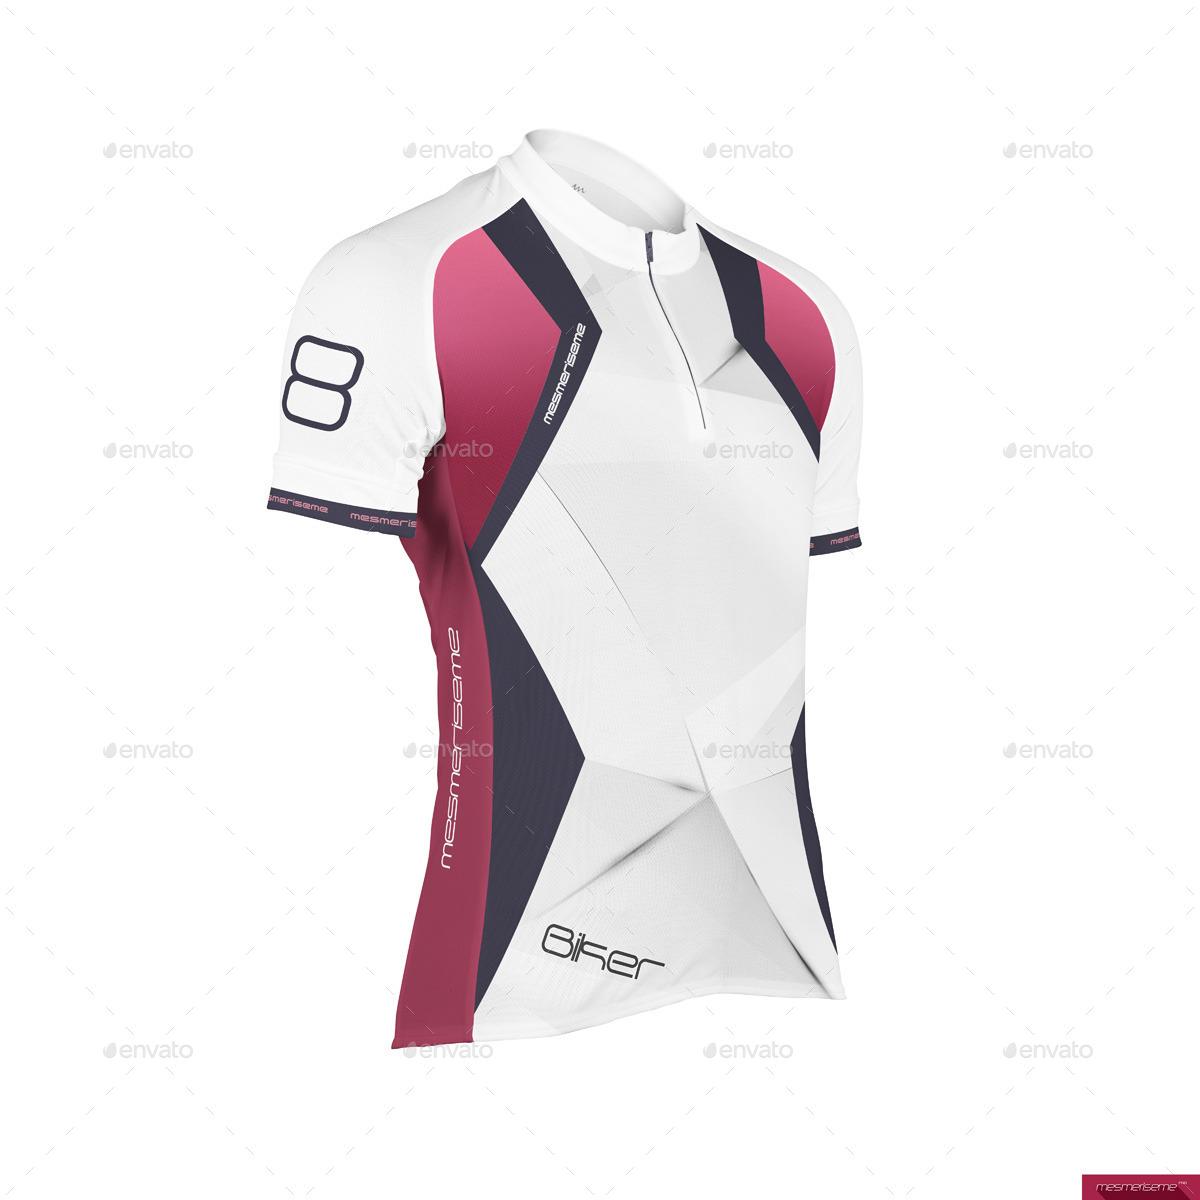 Bike Jersey Short Zip Mock-up by mesmeriseme pro  5ade7e0e6